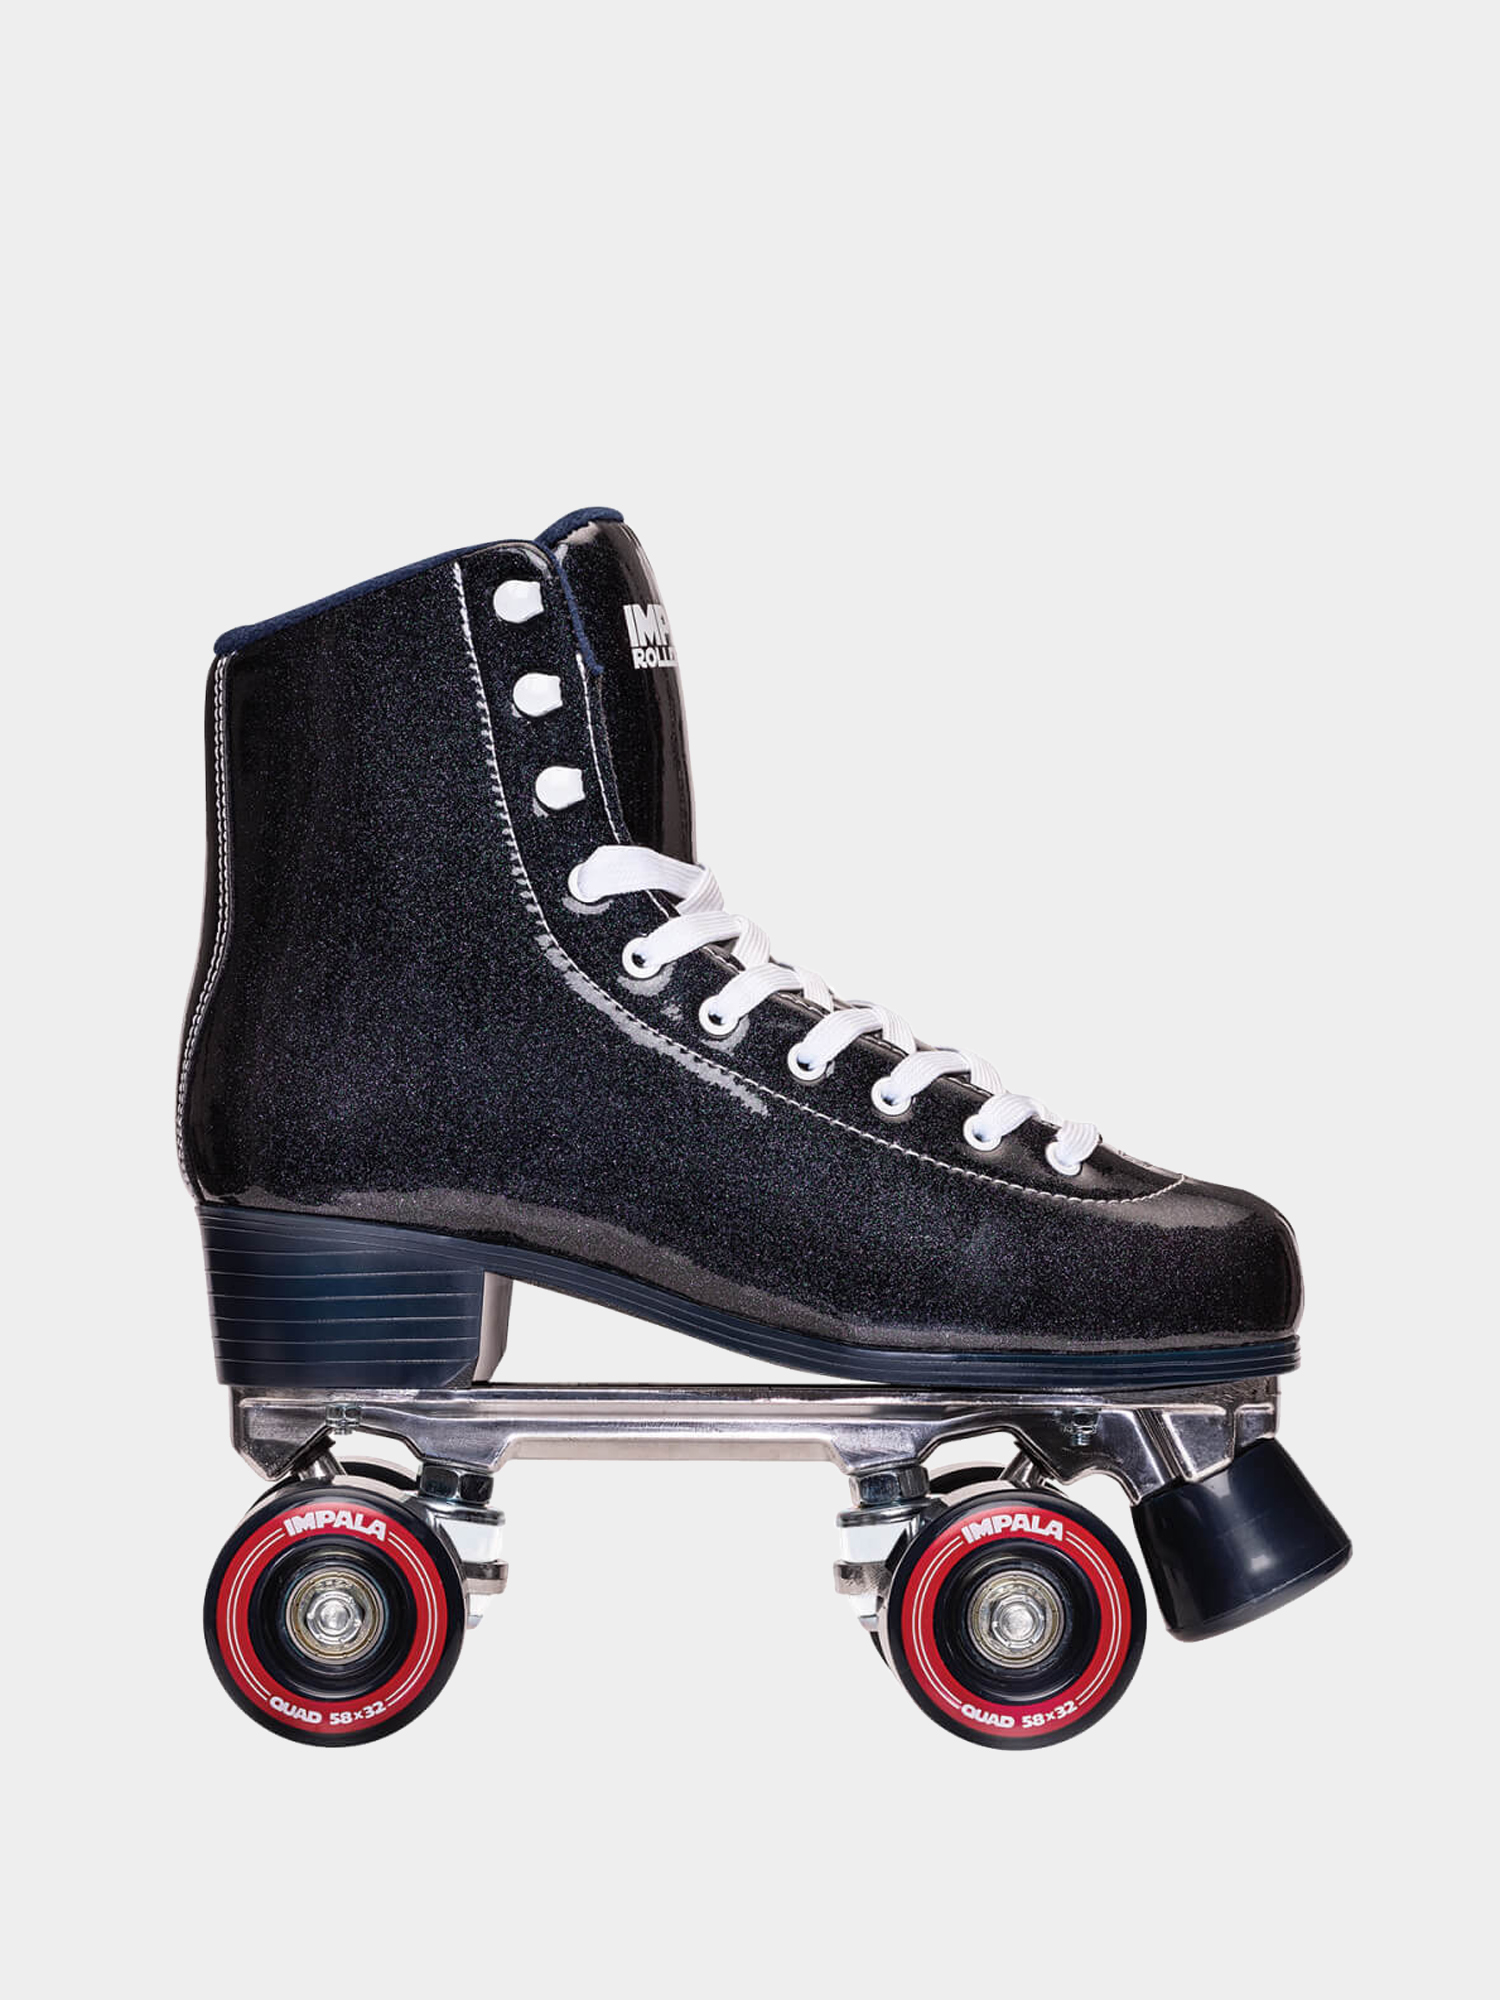 Wrotki Impala Quad Skate Wmn (midnight)